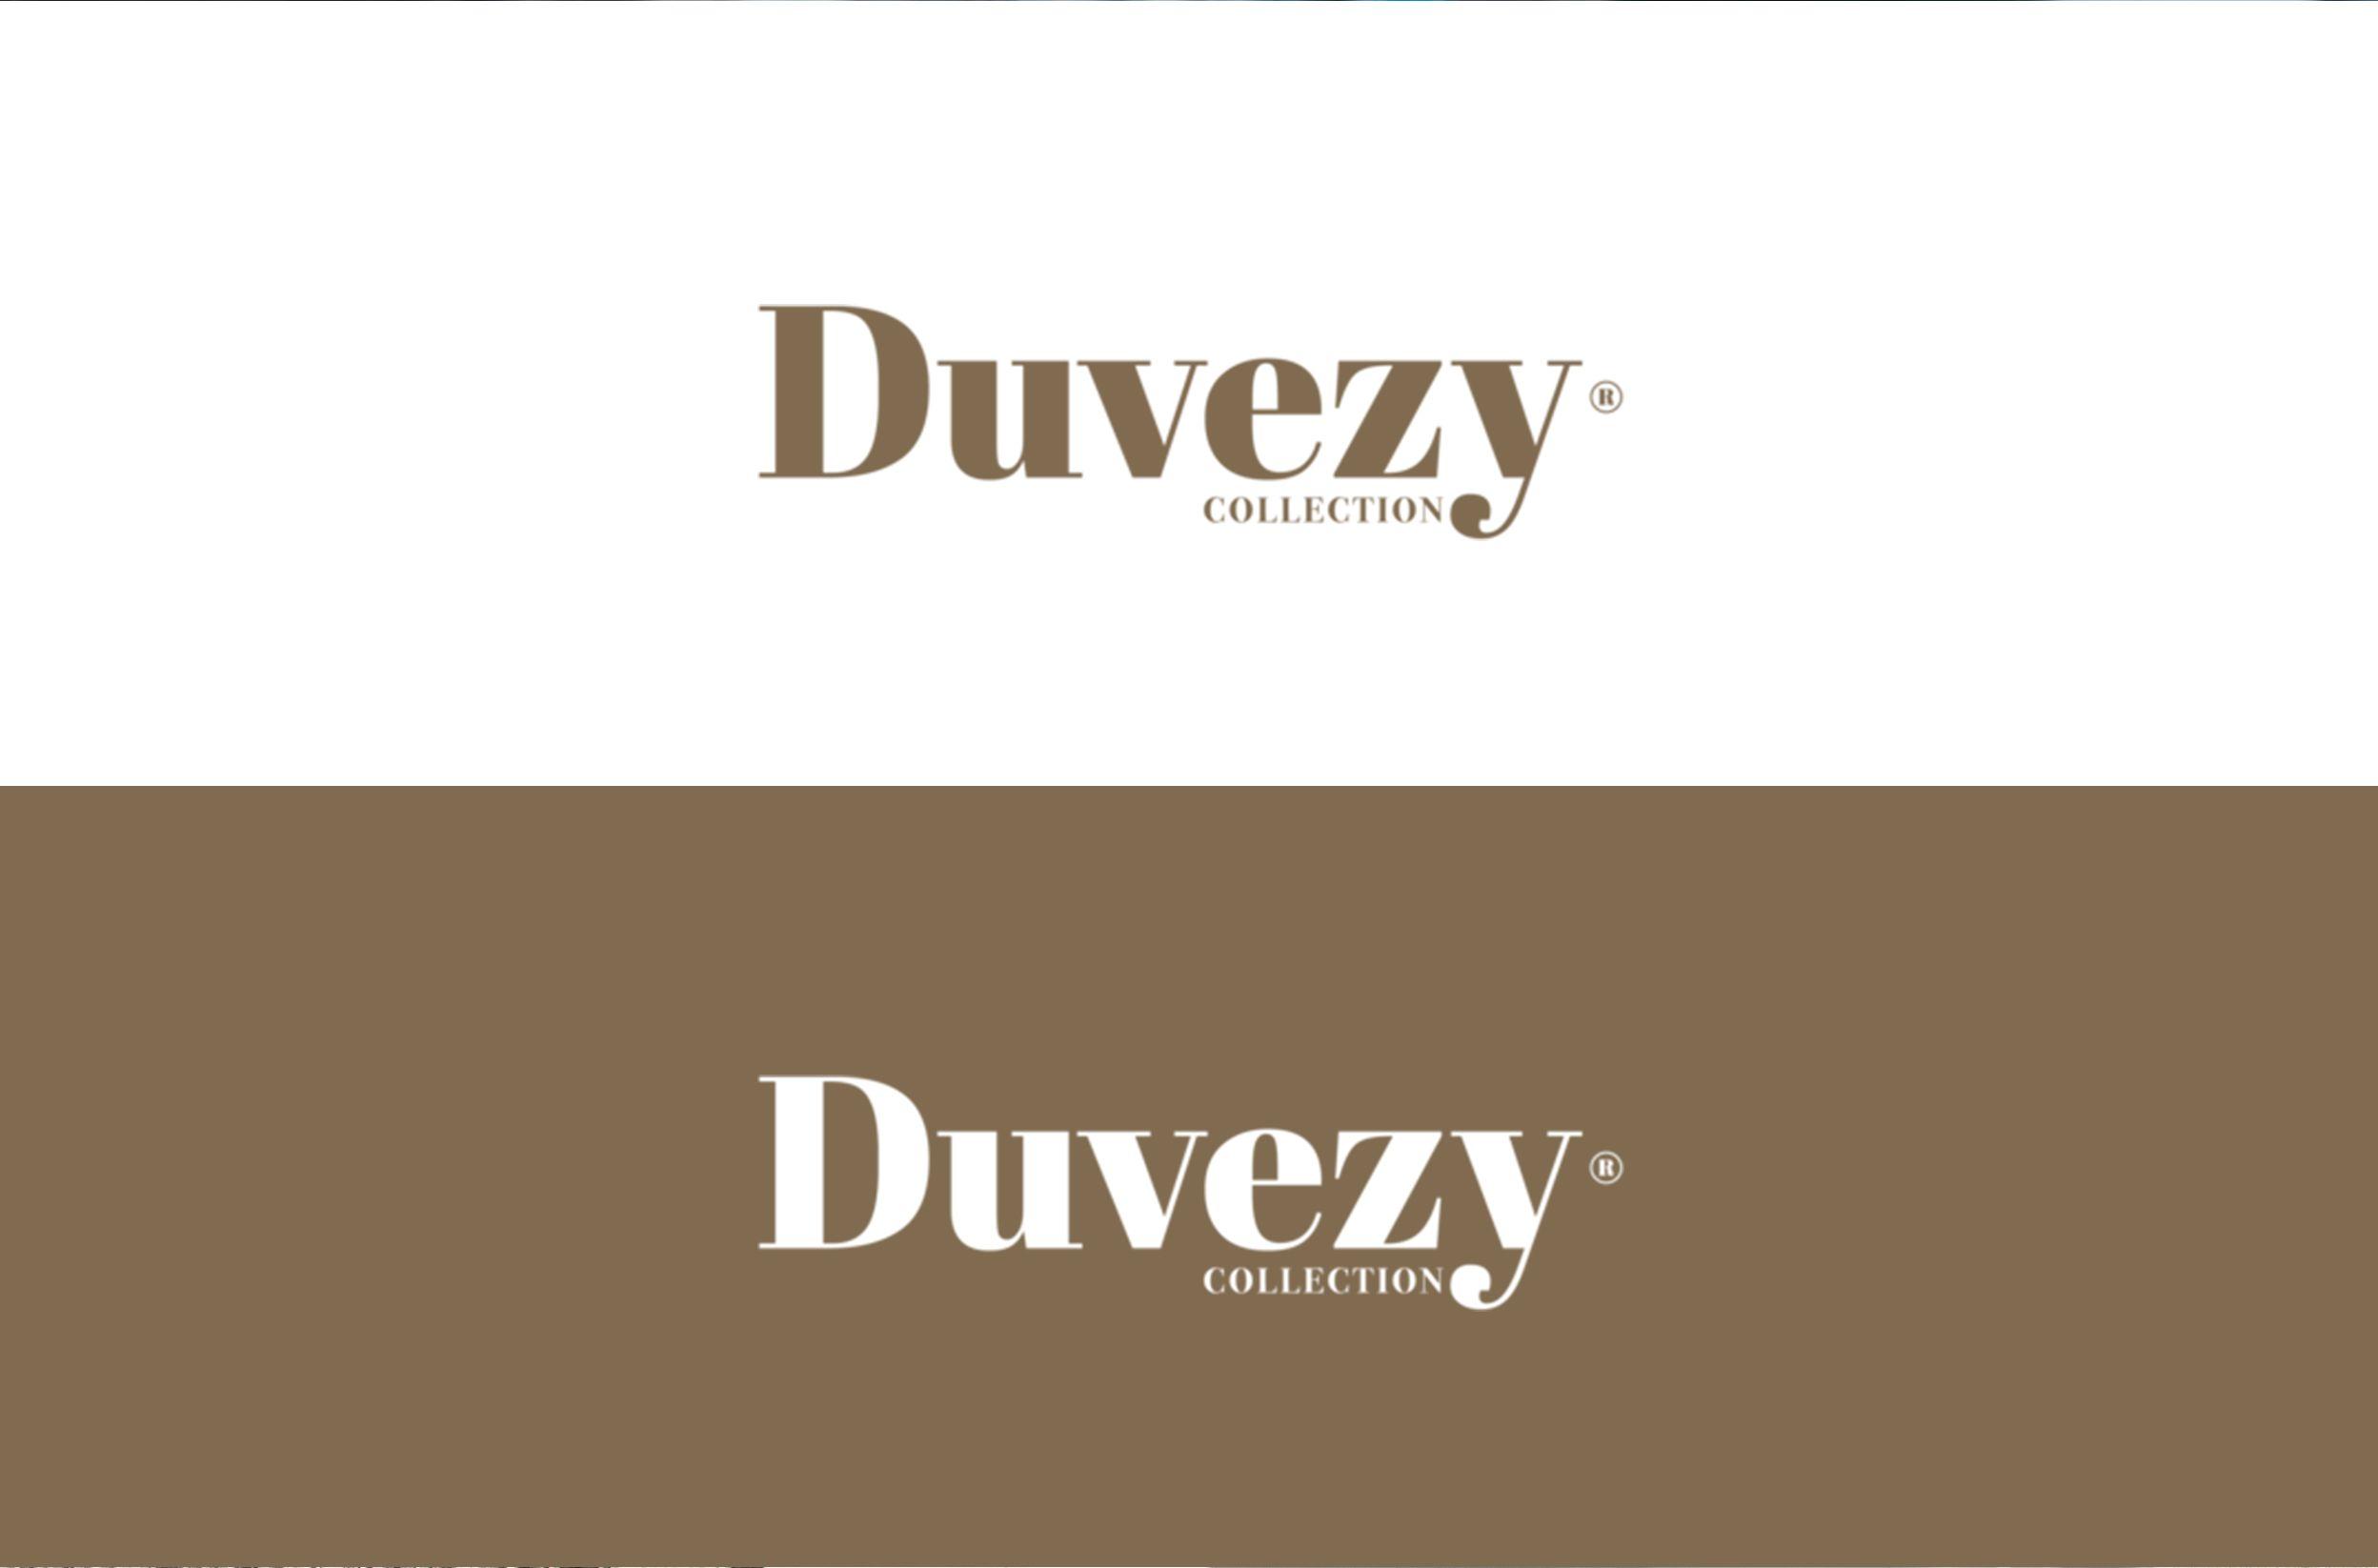 duvezy-2